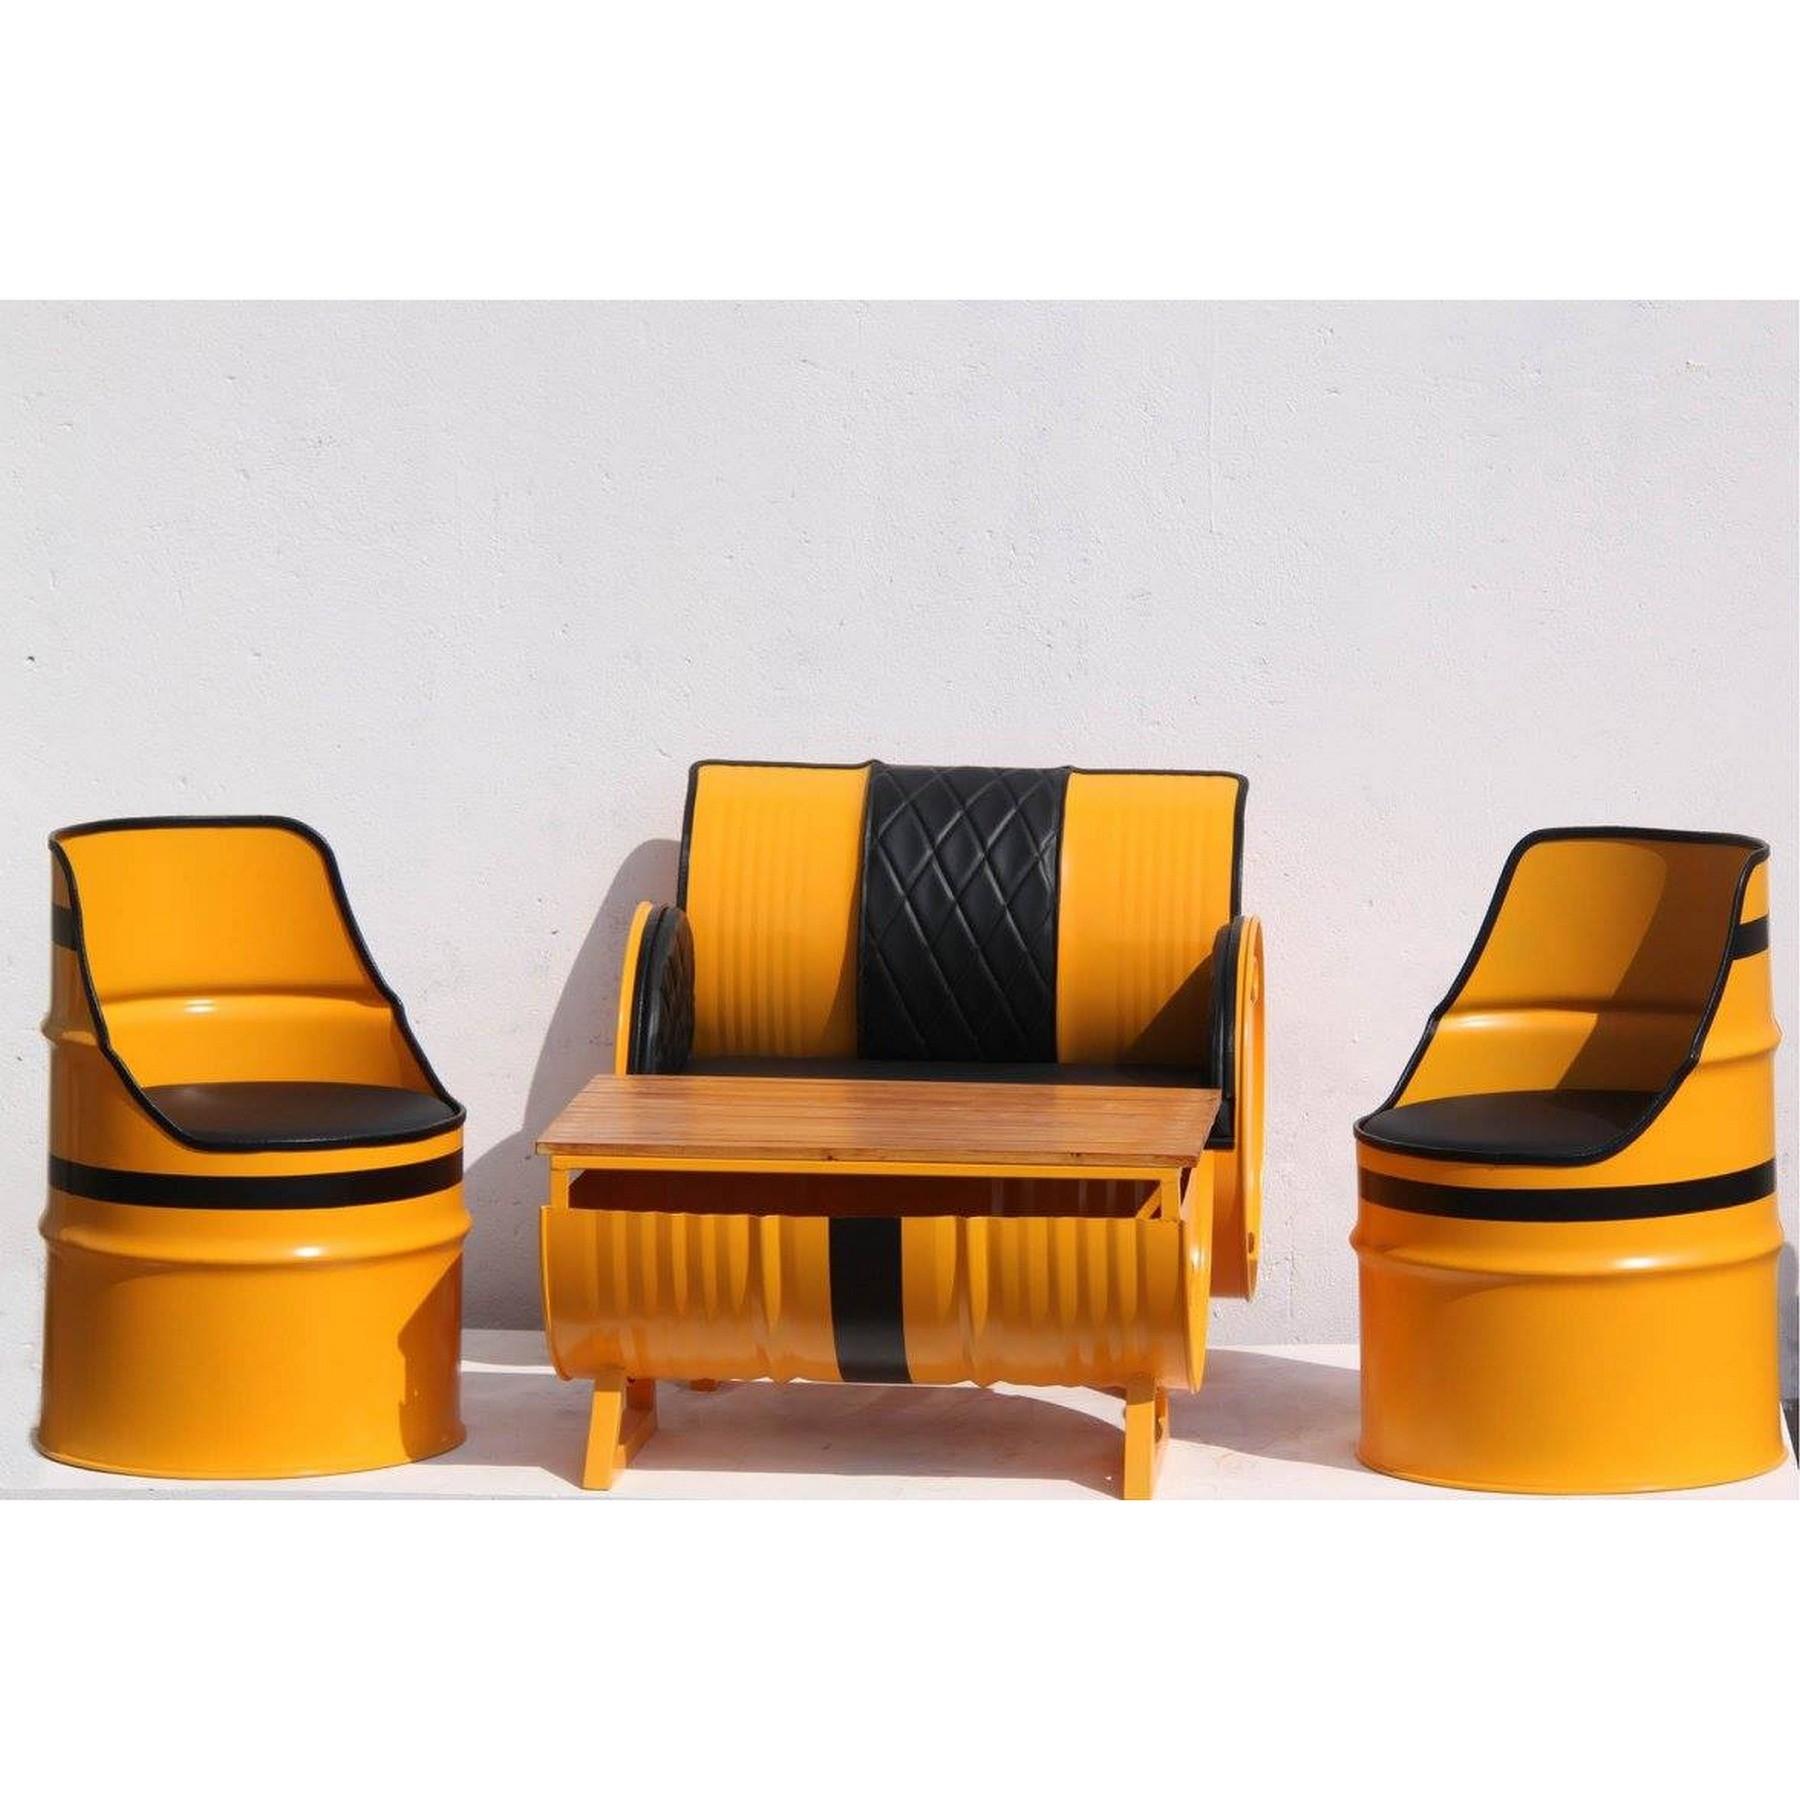 Garden Furniture sofa Set, Industrial outdoor furniture